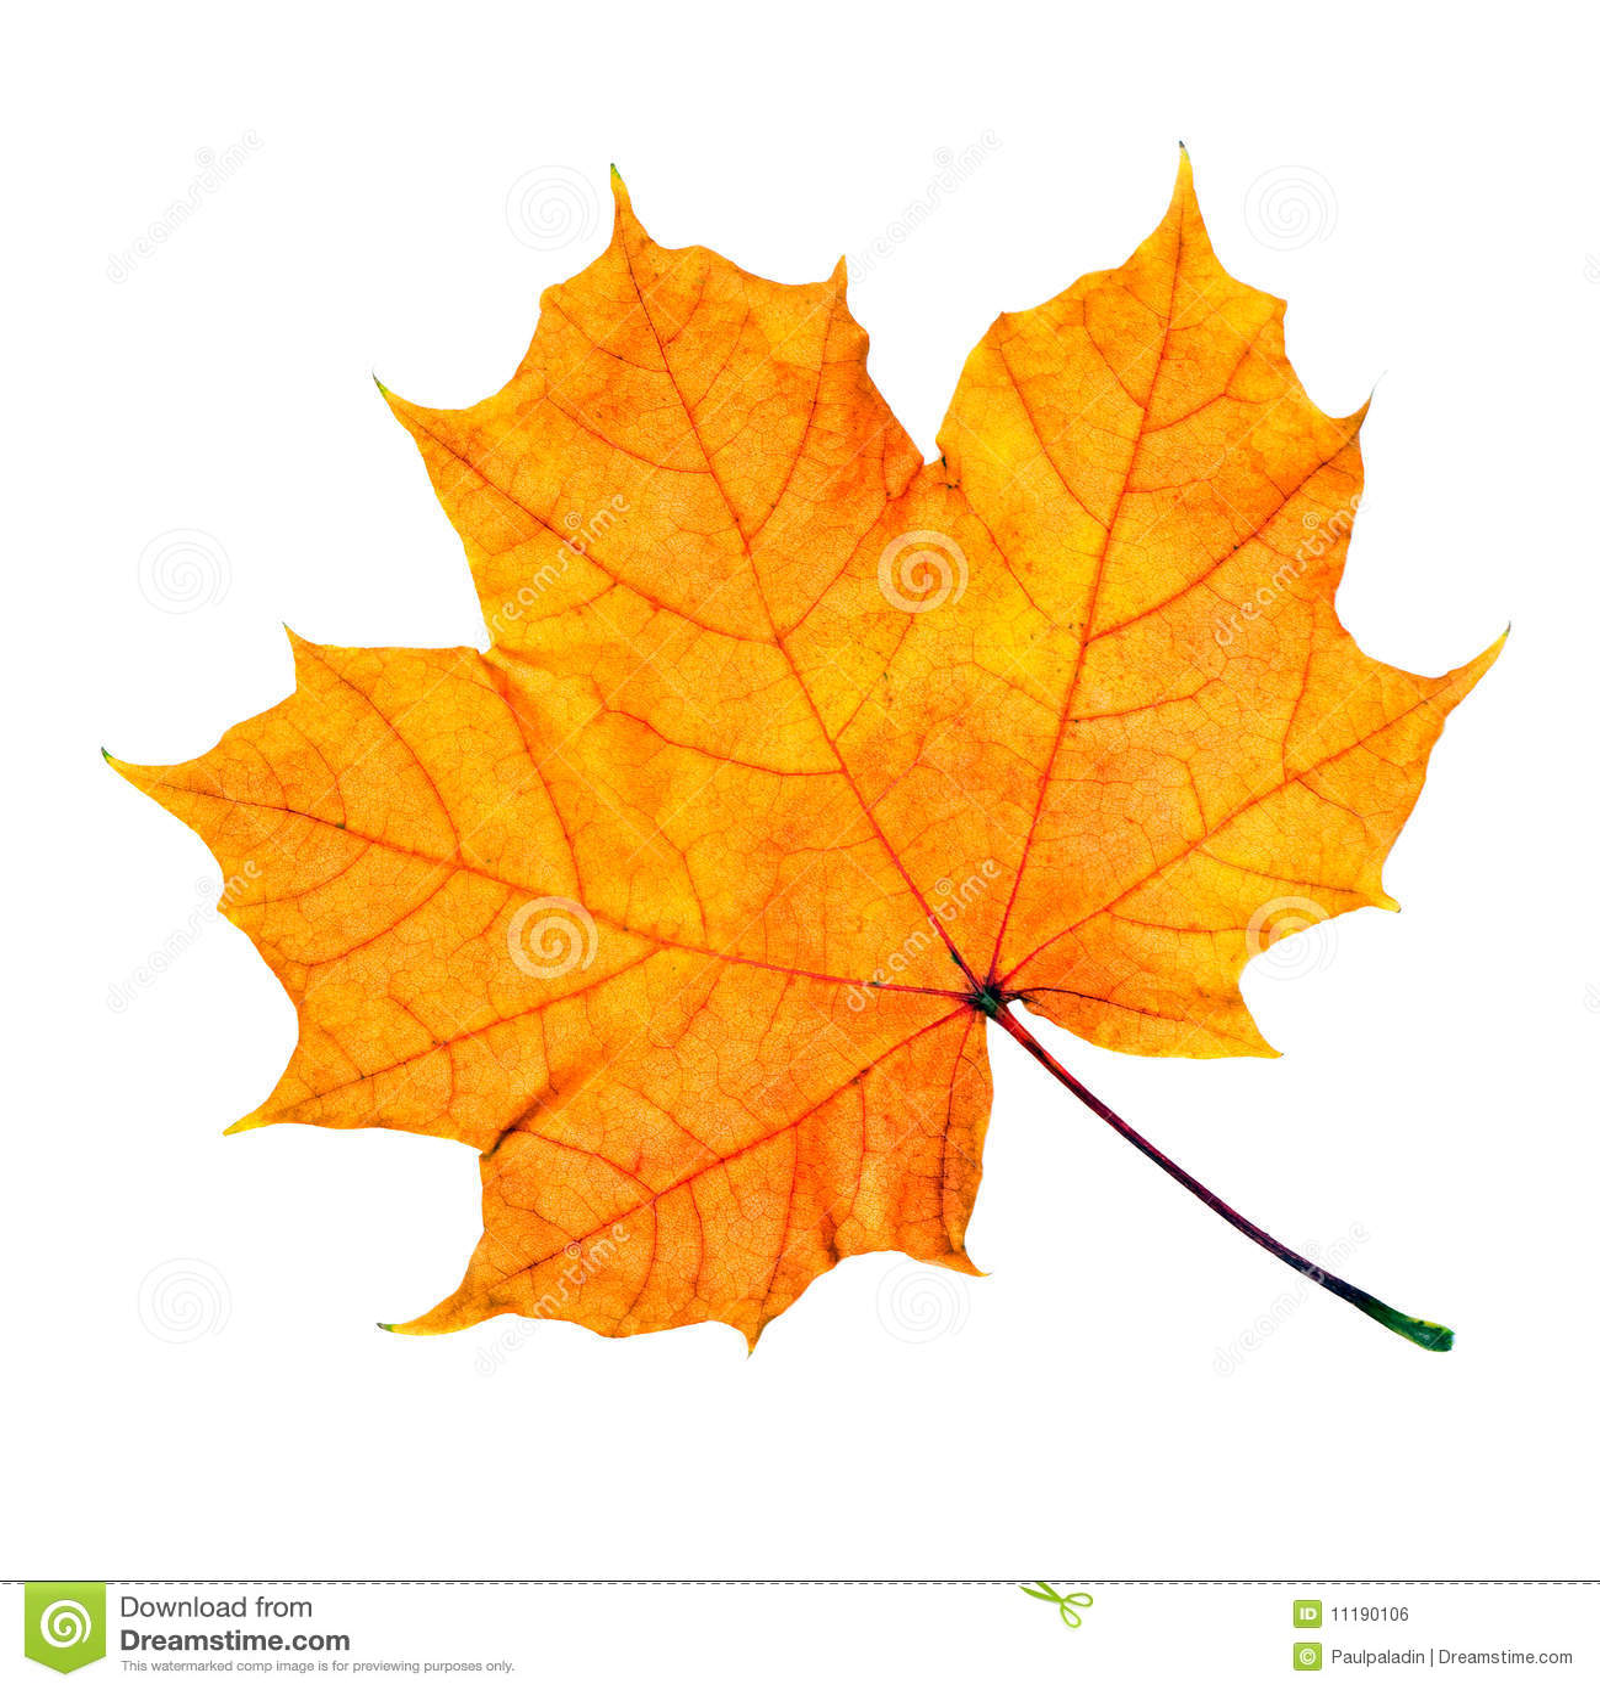 Maple Fall Leaf Royalty Free Stock Image - Image: 11190106